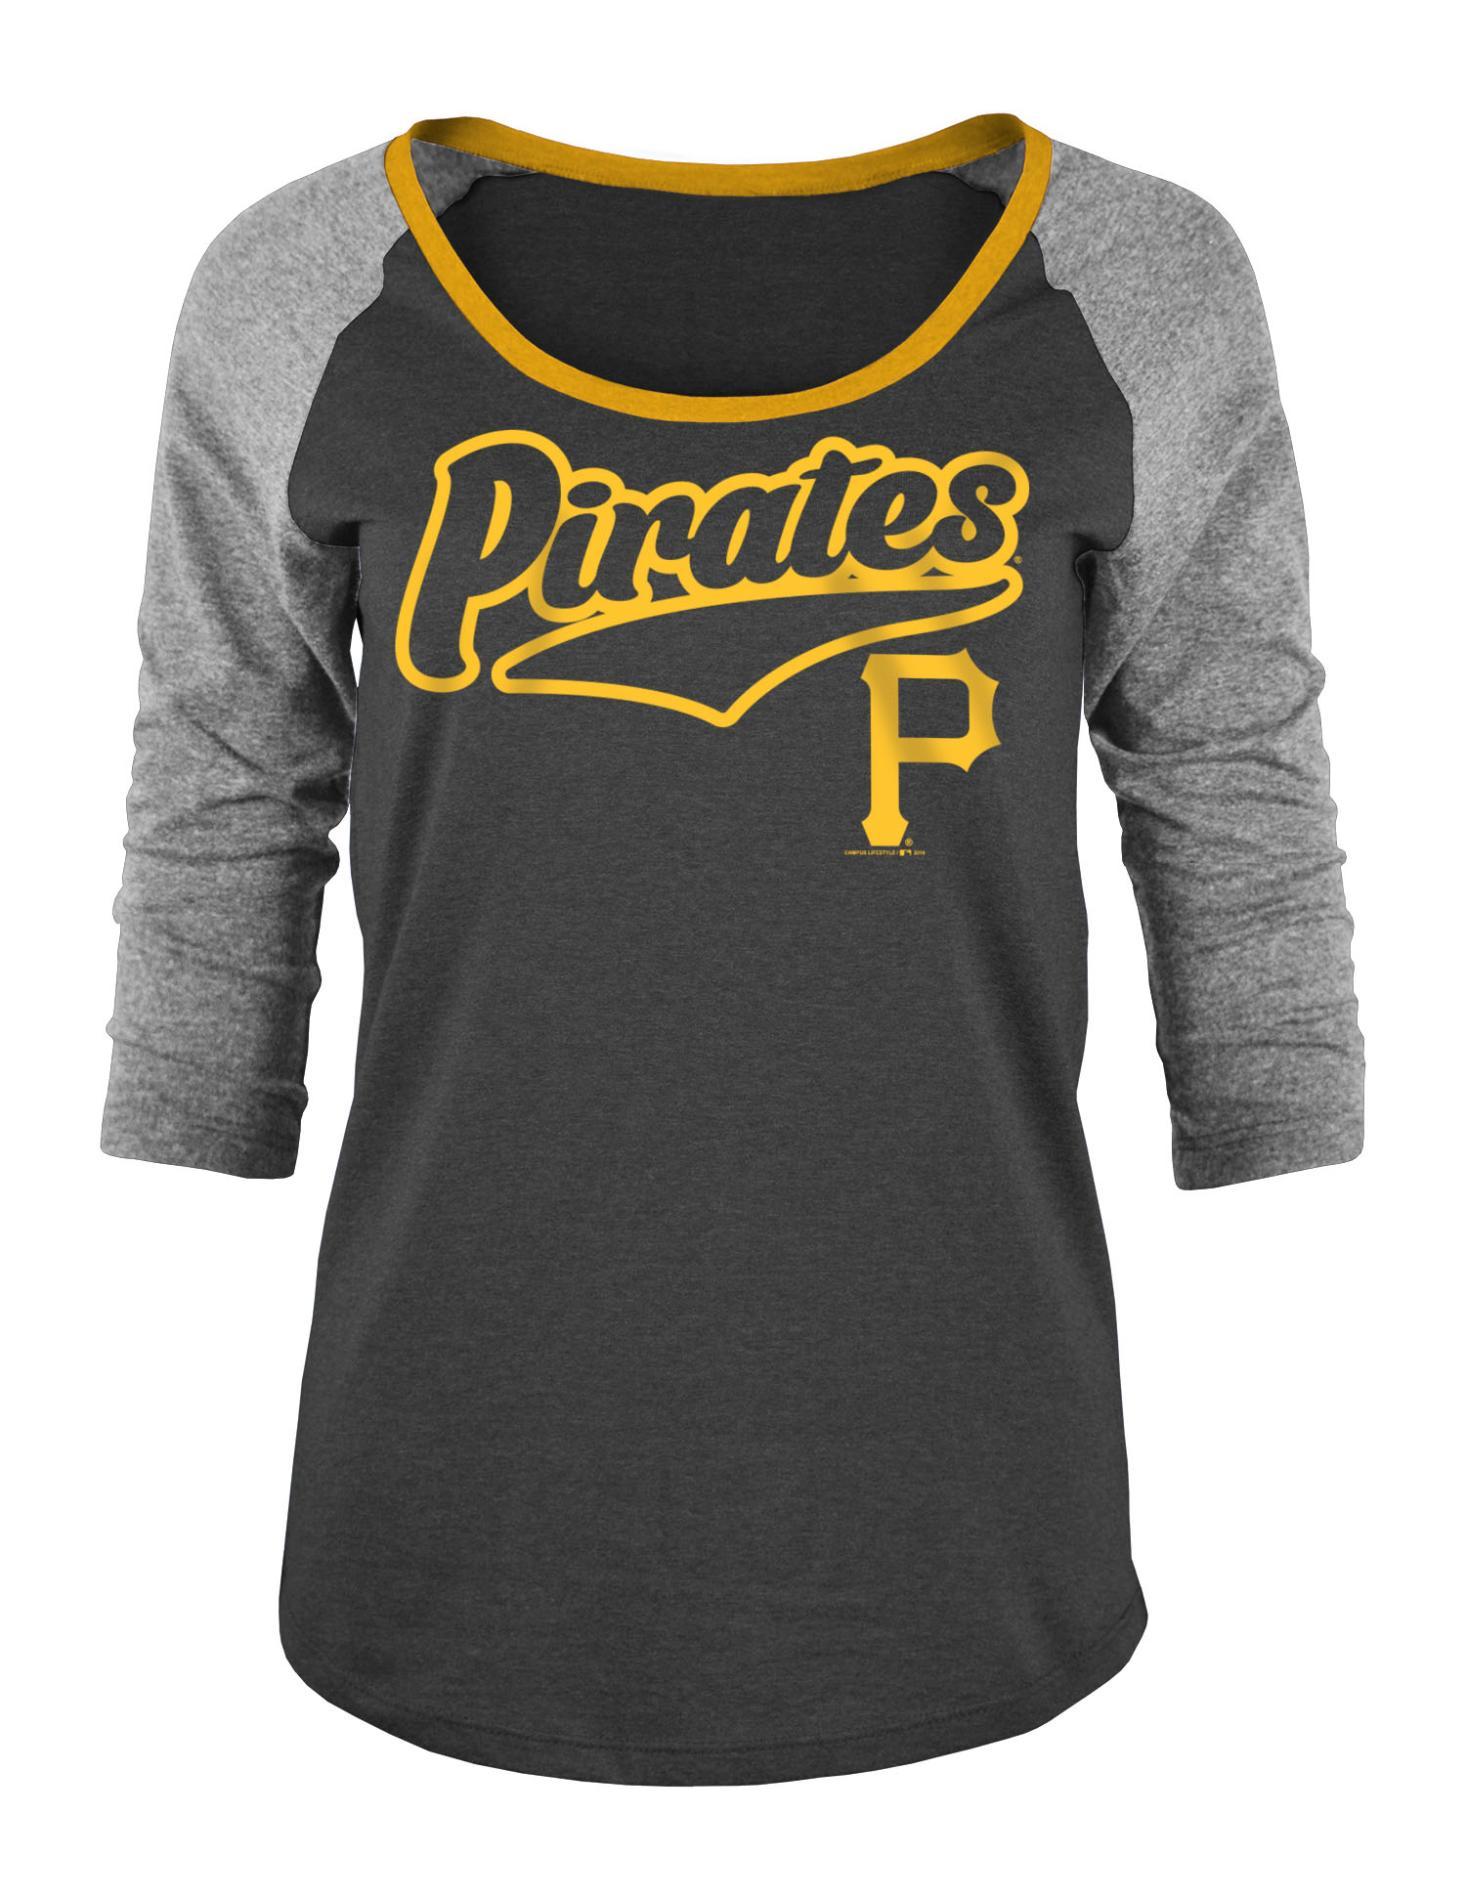 MLB Women's Raglan T-Shirt - Pittsburgh Pirates